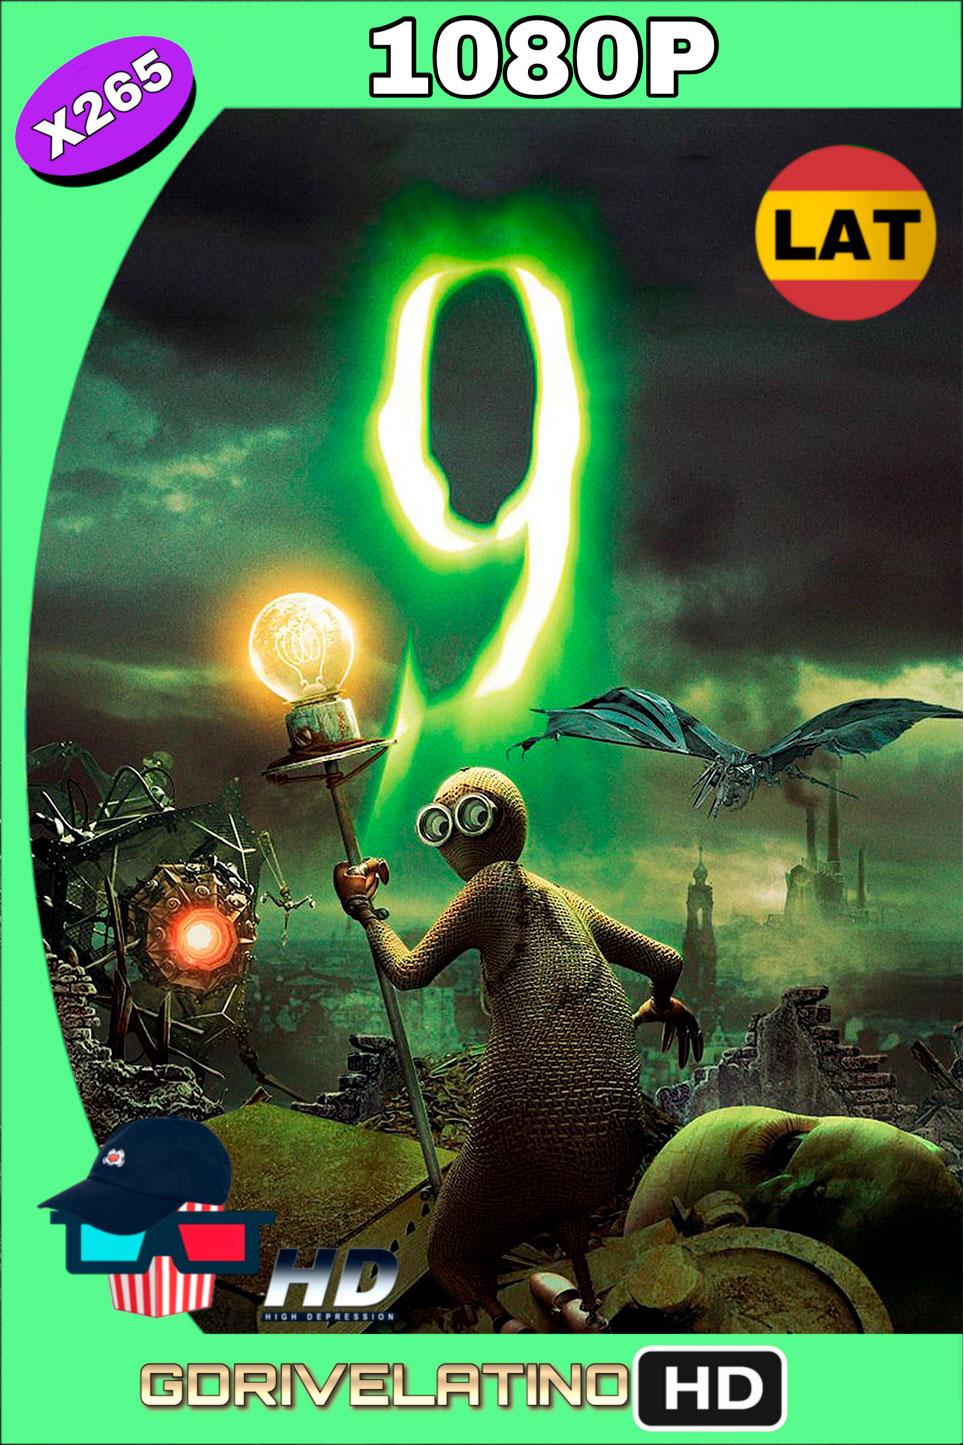 Número 9 (2009) x265 1080p Latino-Ingles MKV